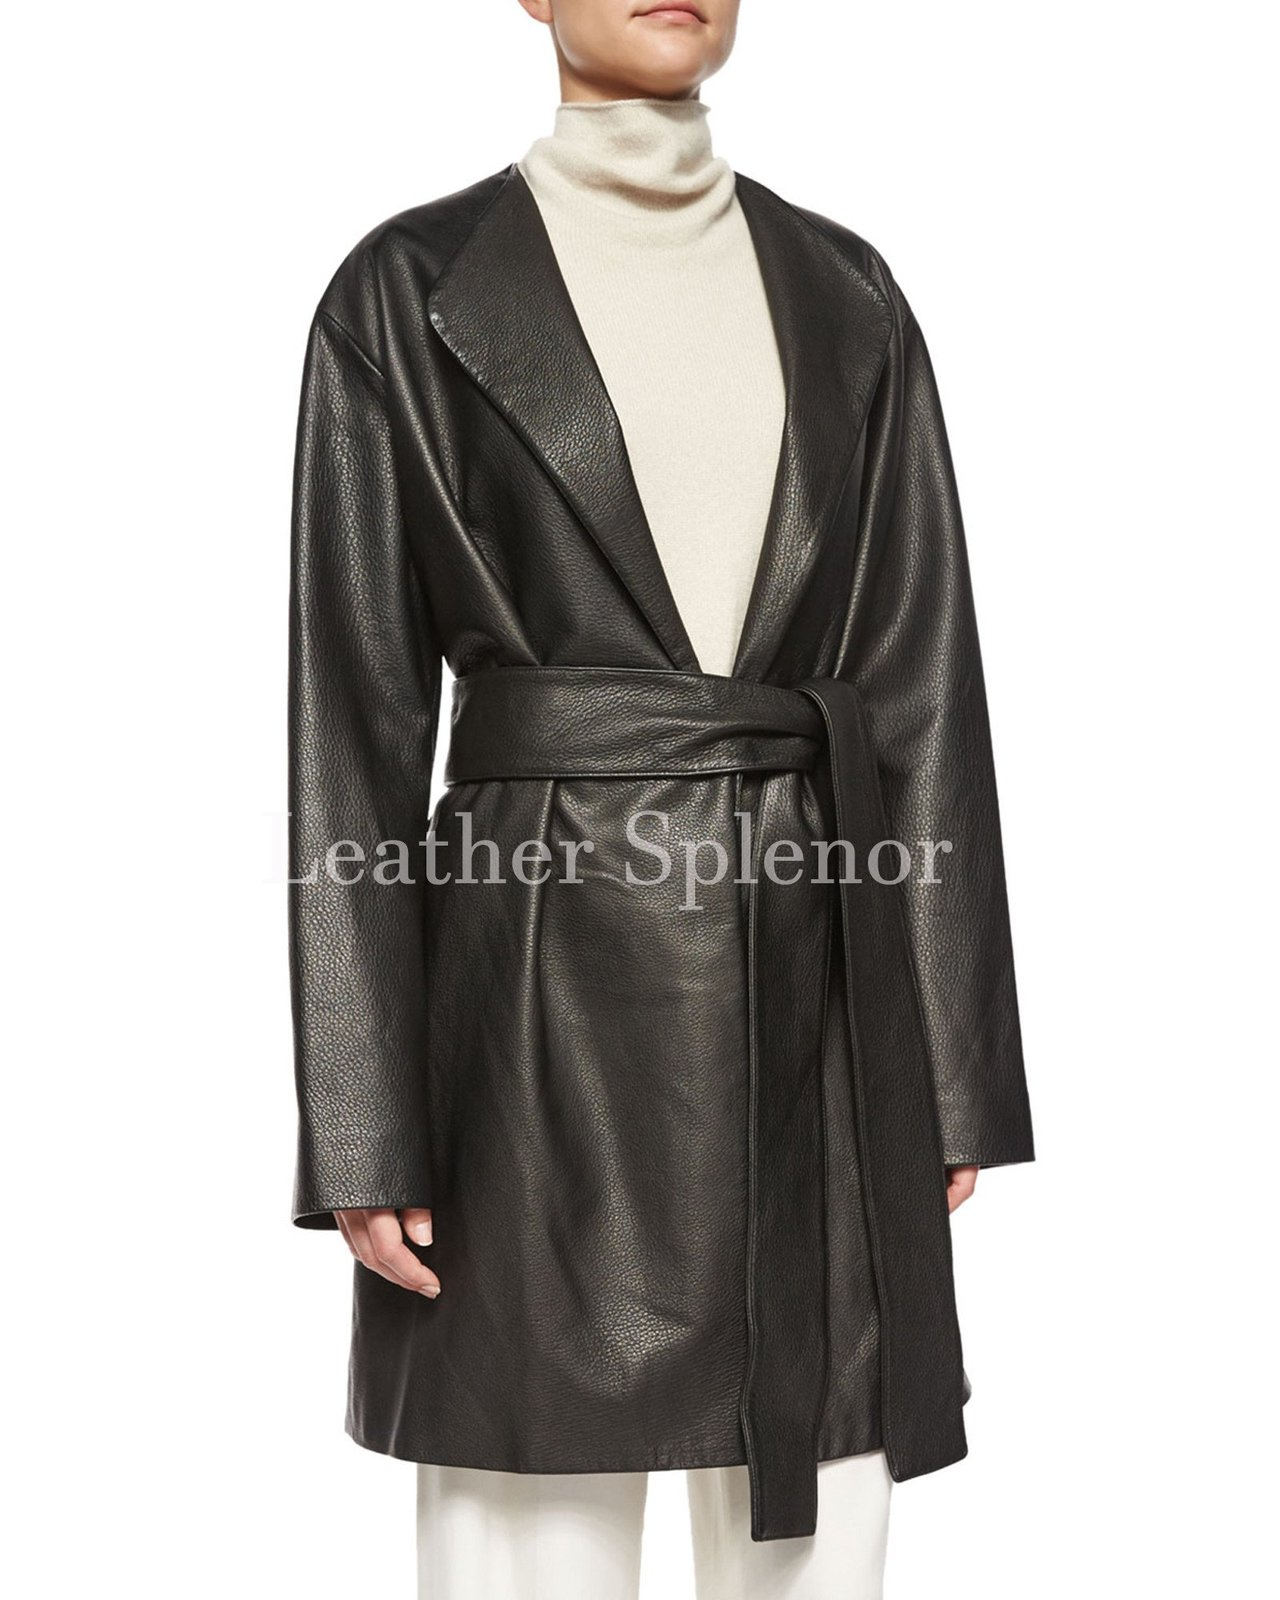 Belted Waist Women Leather Coat